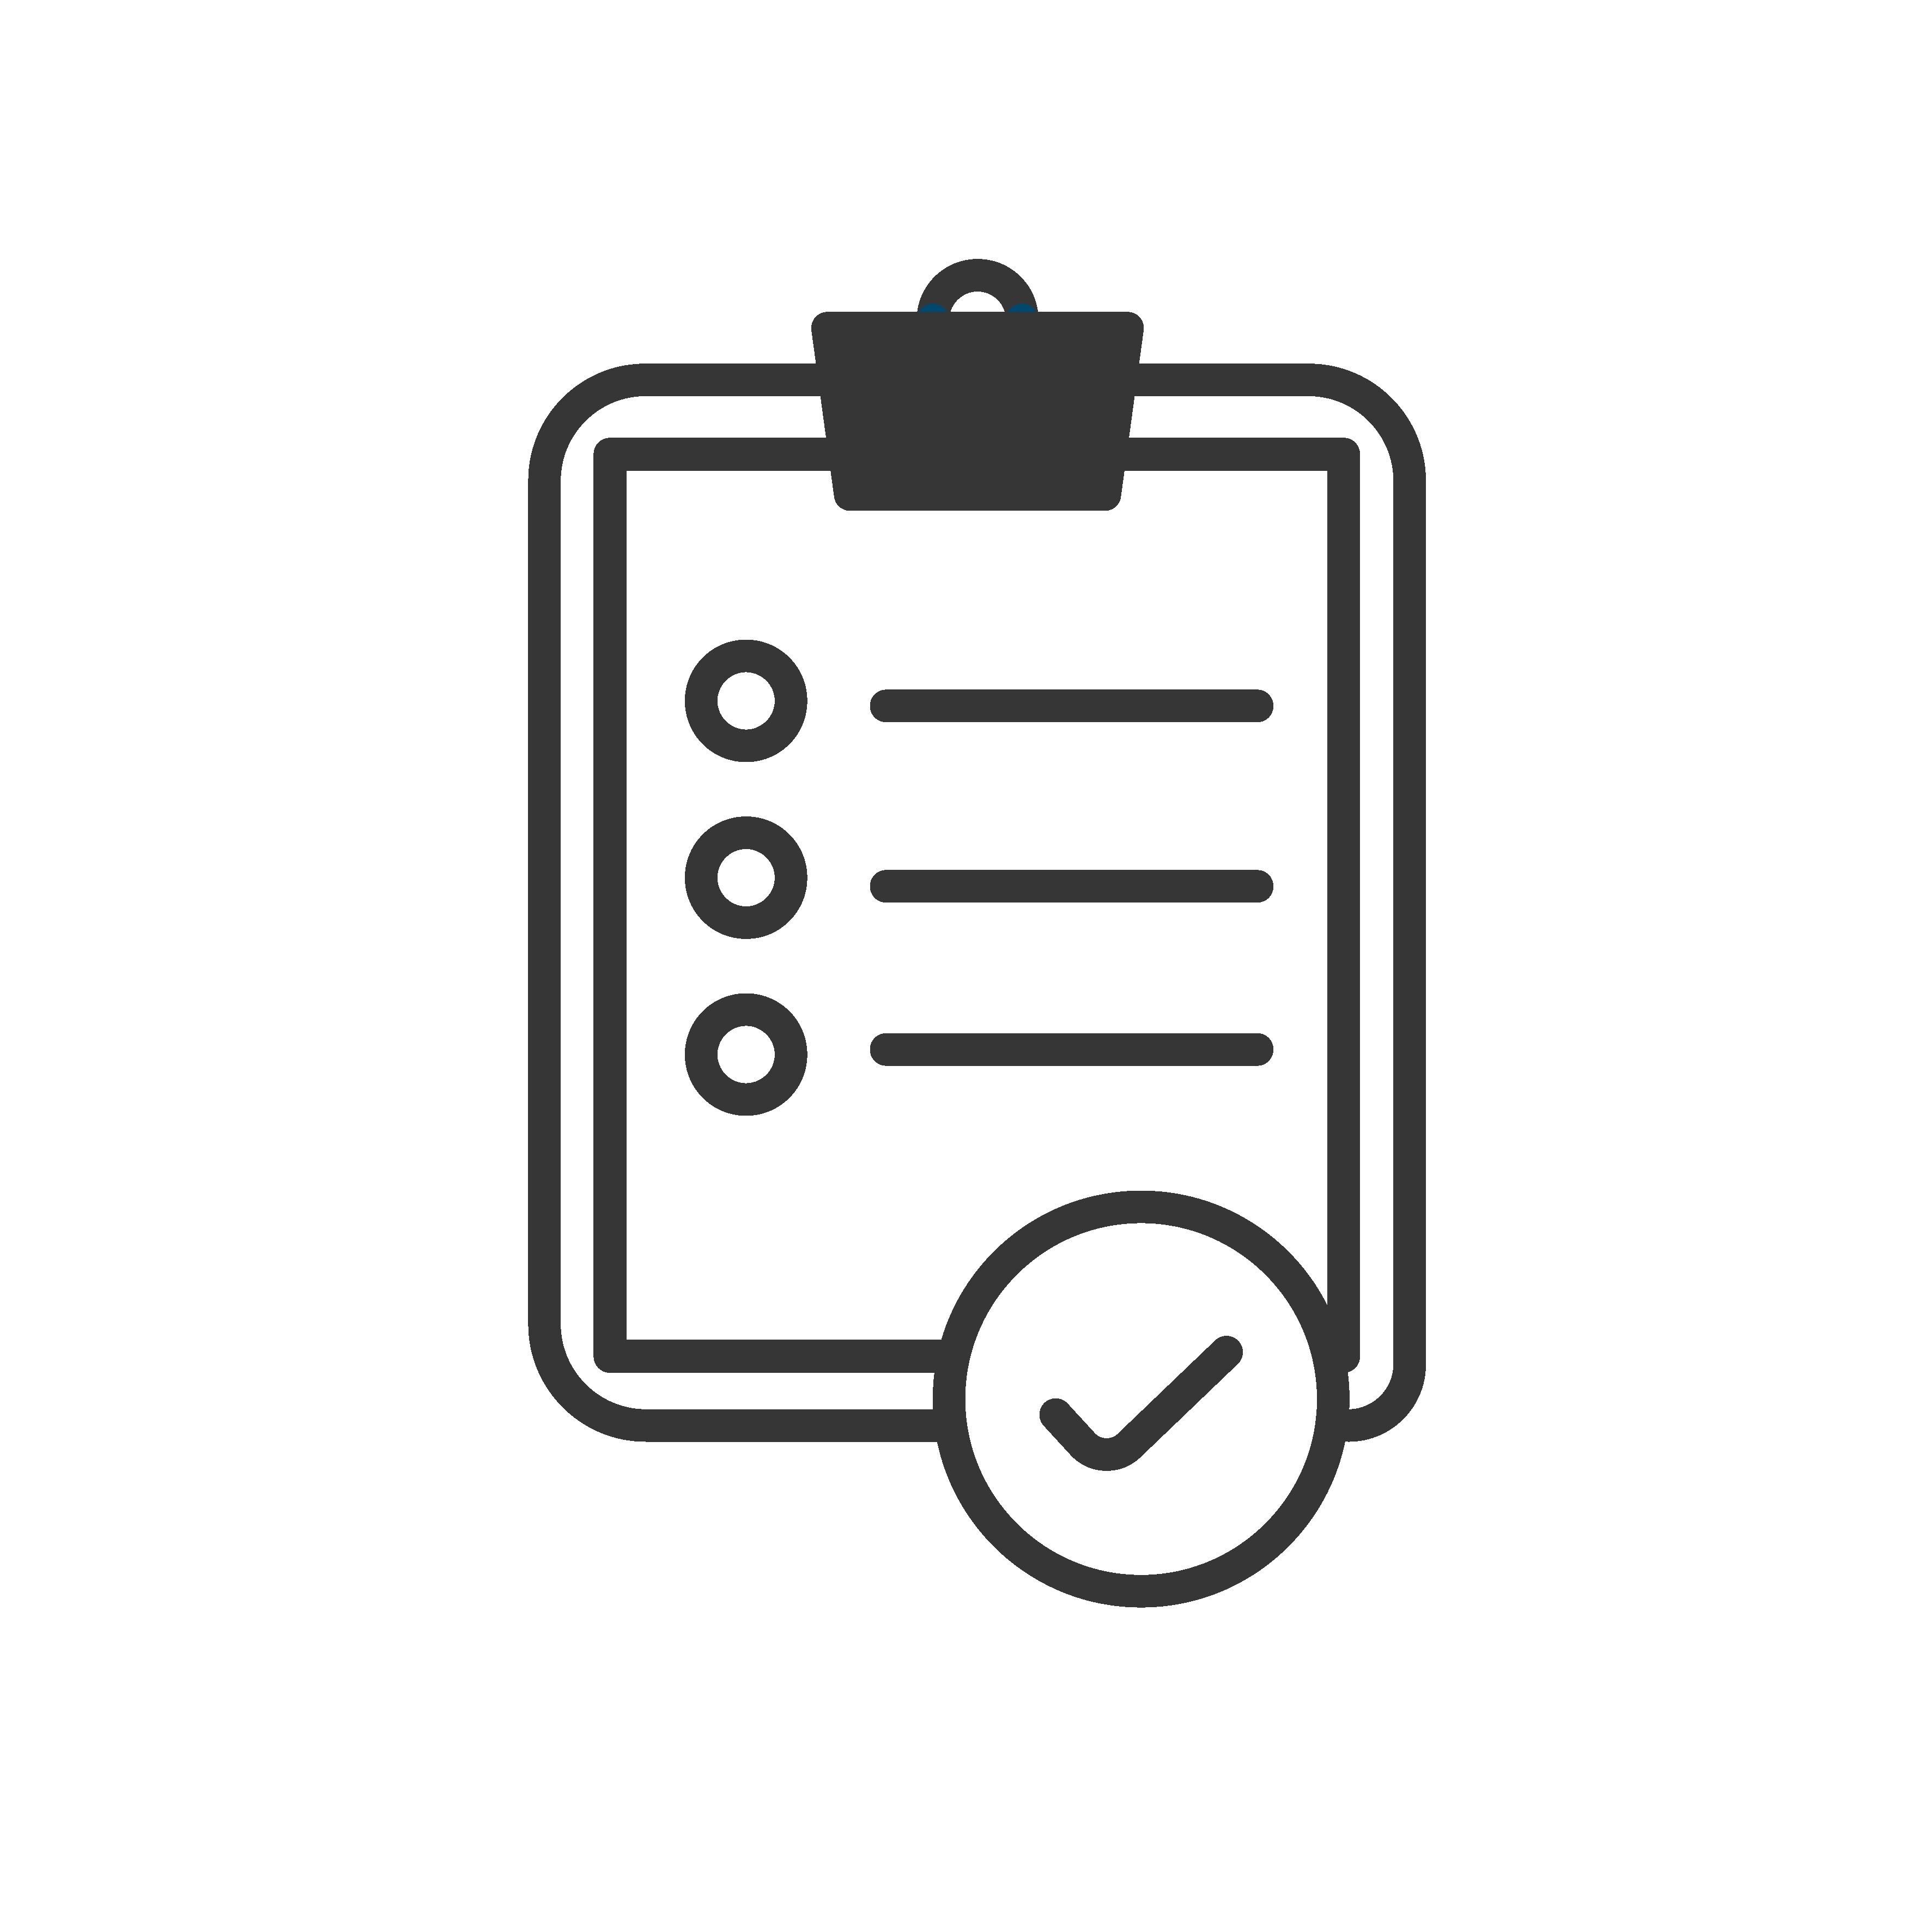 Site Survey Icon